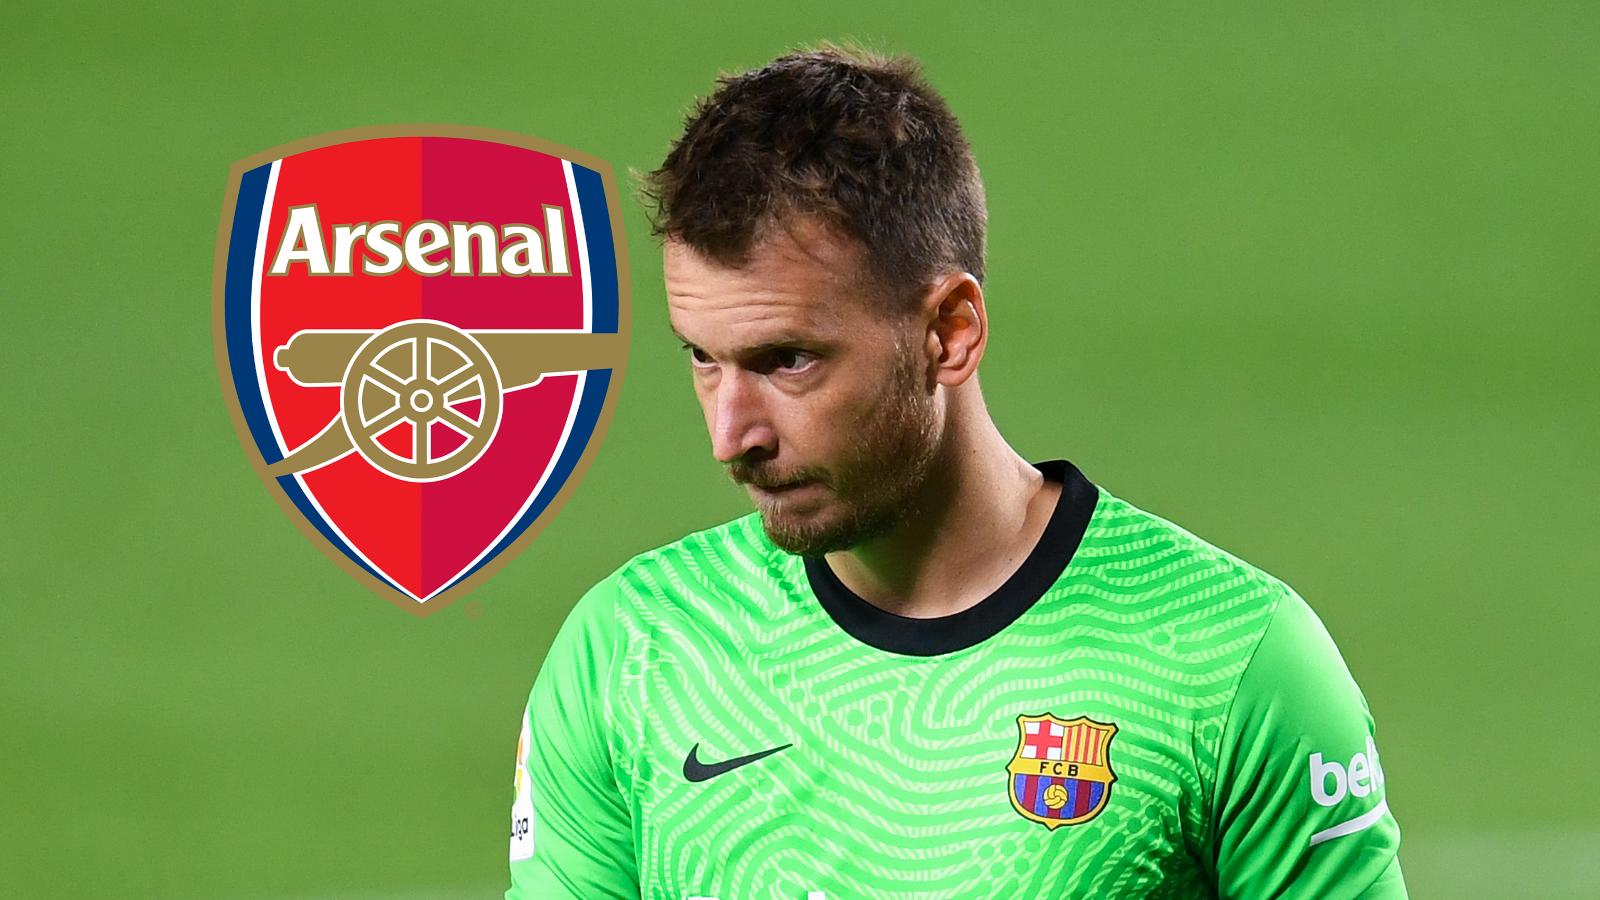 Transfer news and rumours LIVE: Arsenal interested in Barcelona goalkeeper  Neto | Goal.com